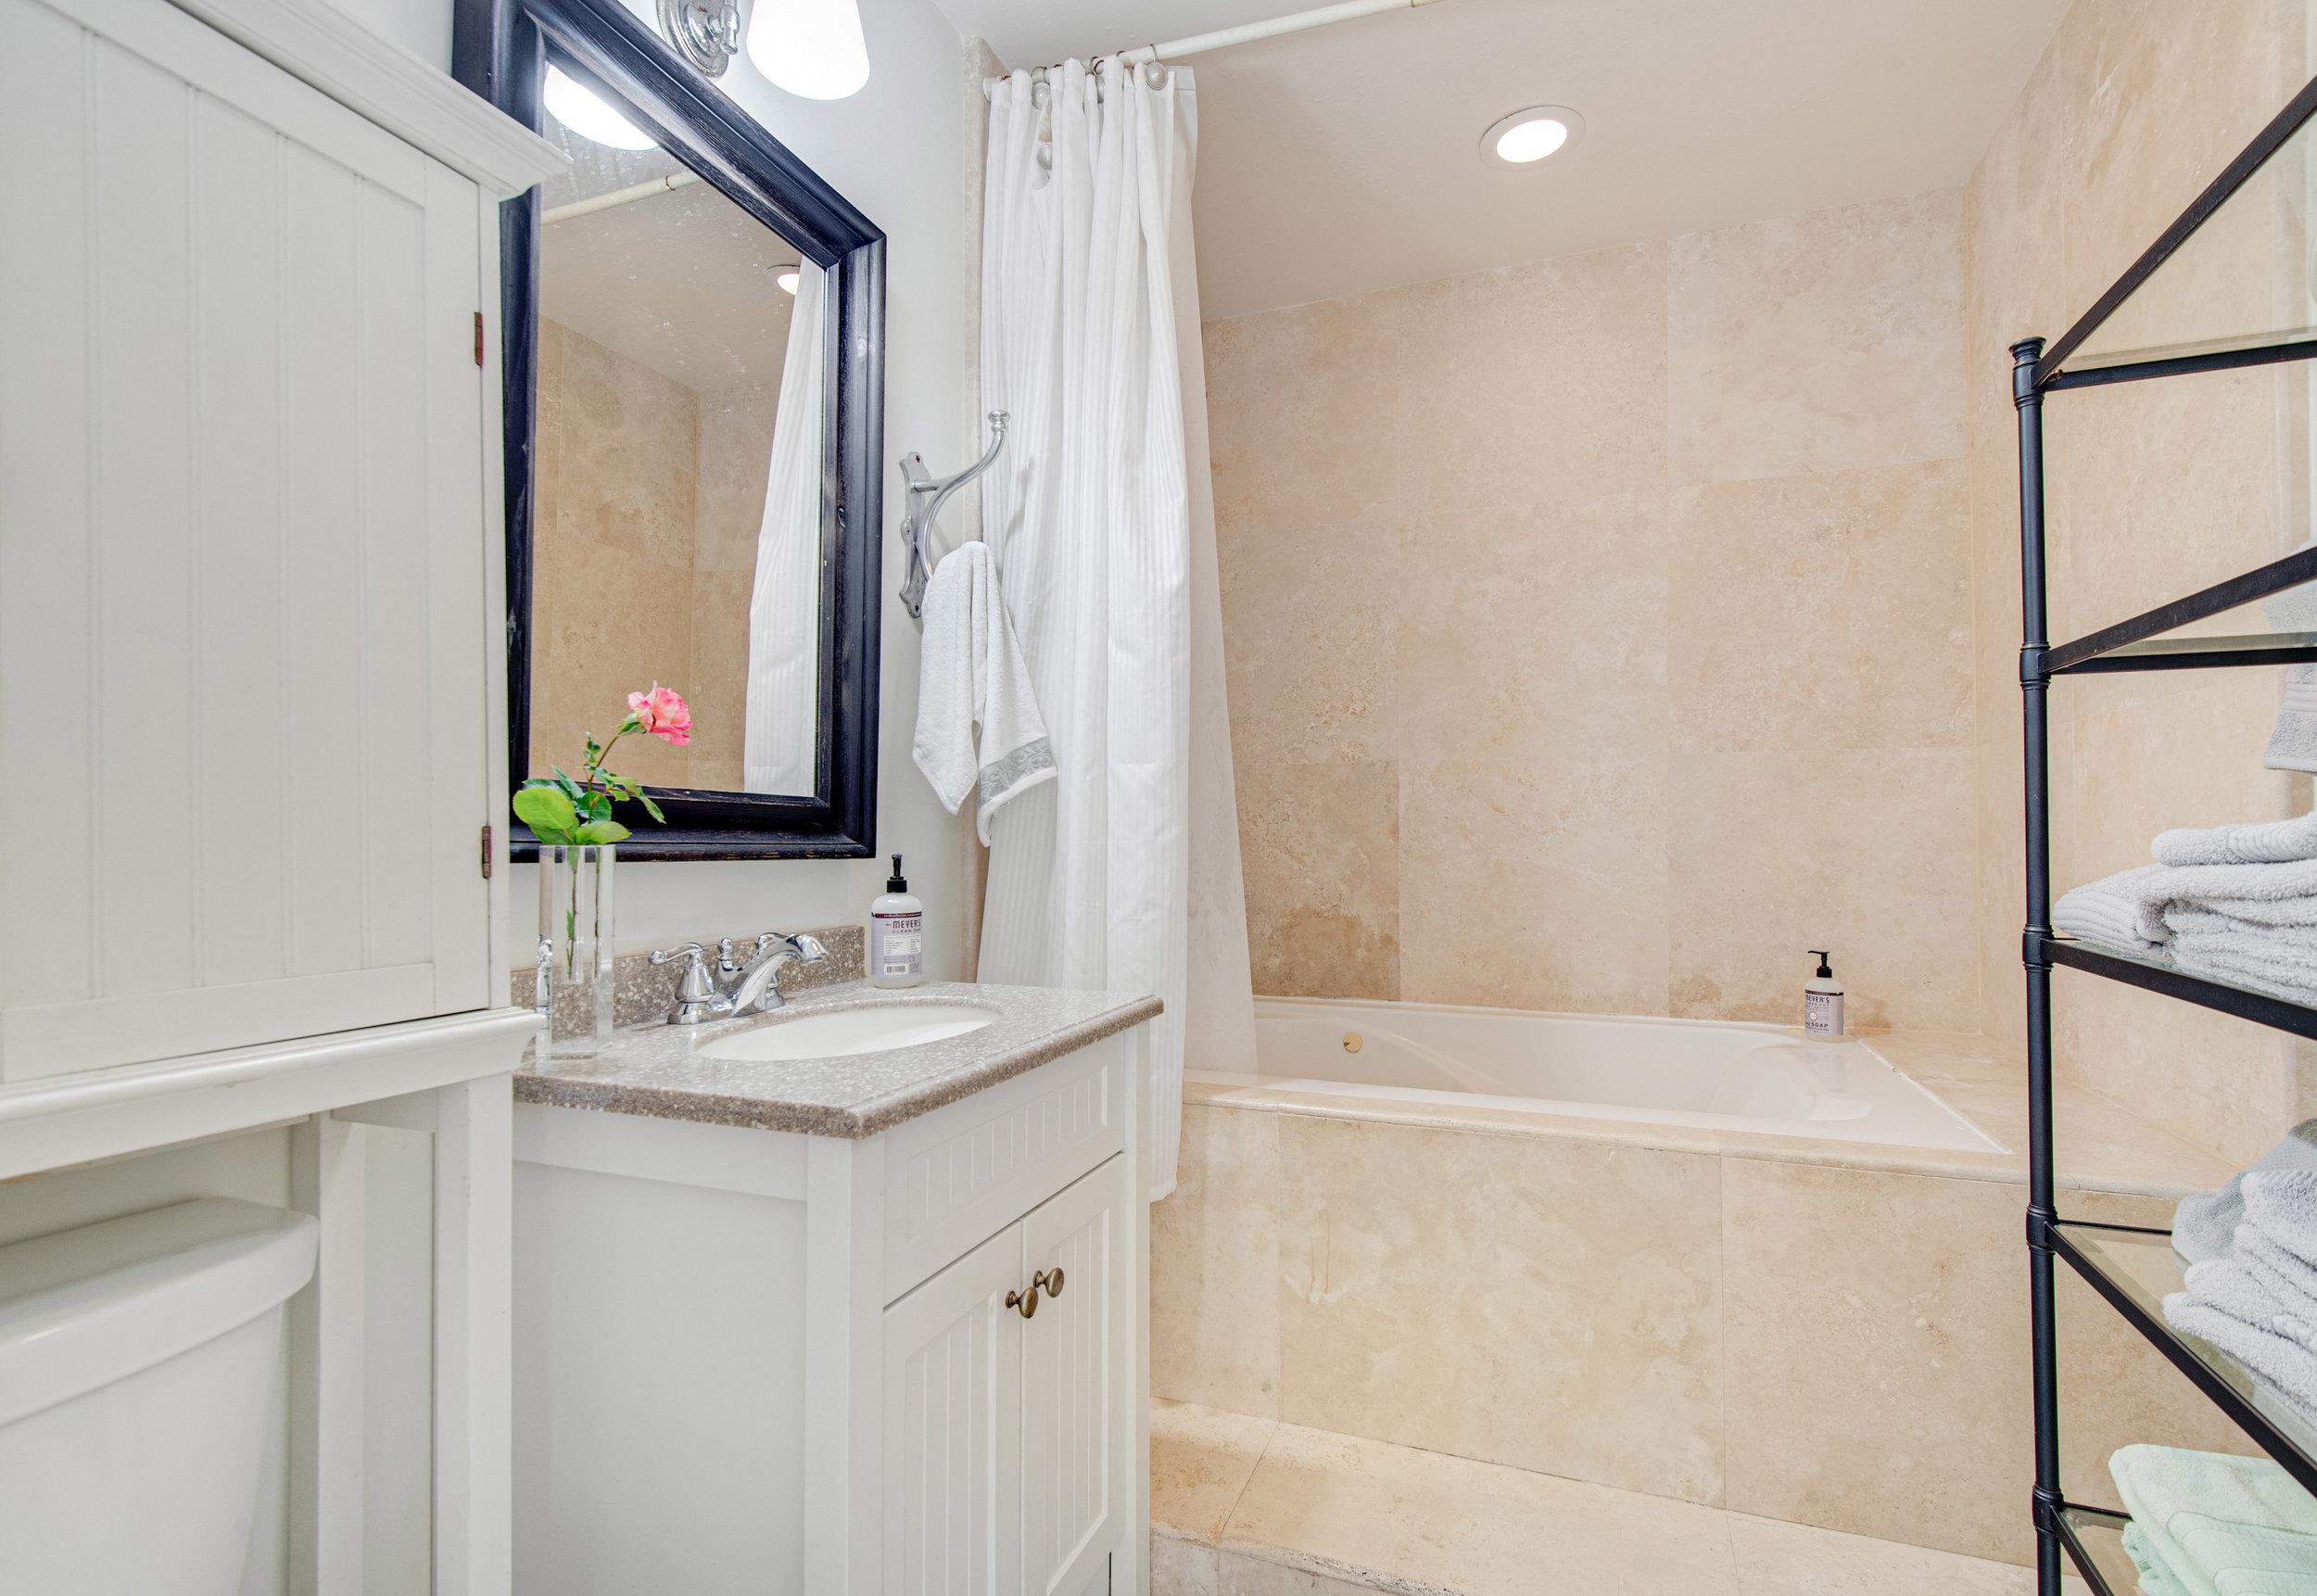 010 Bathroom 3952 Las Flores For Sale Lease The Malibu Life Team Luxury Real Estate.jpg